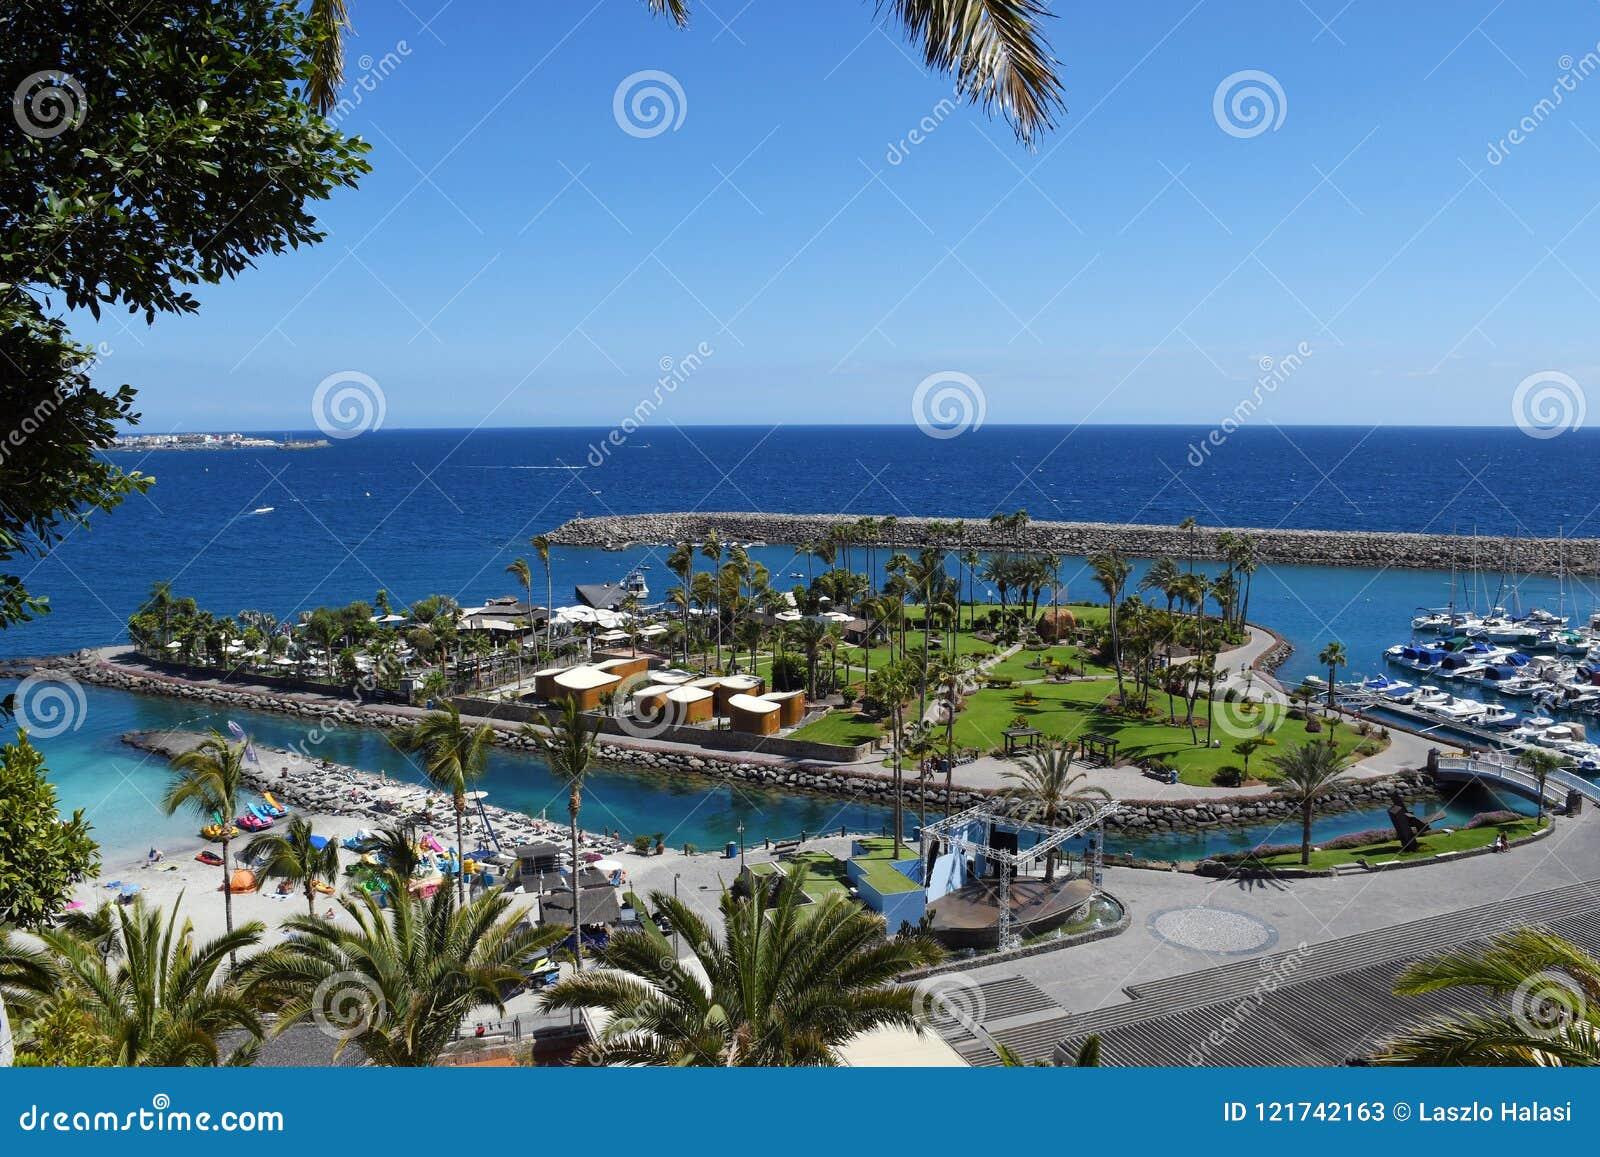 Playa de Mst del fel de Anfi, isla de Gran Canaria, España